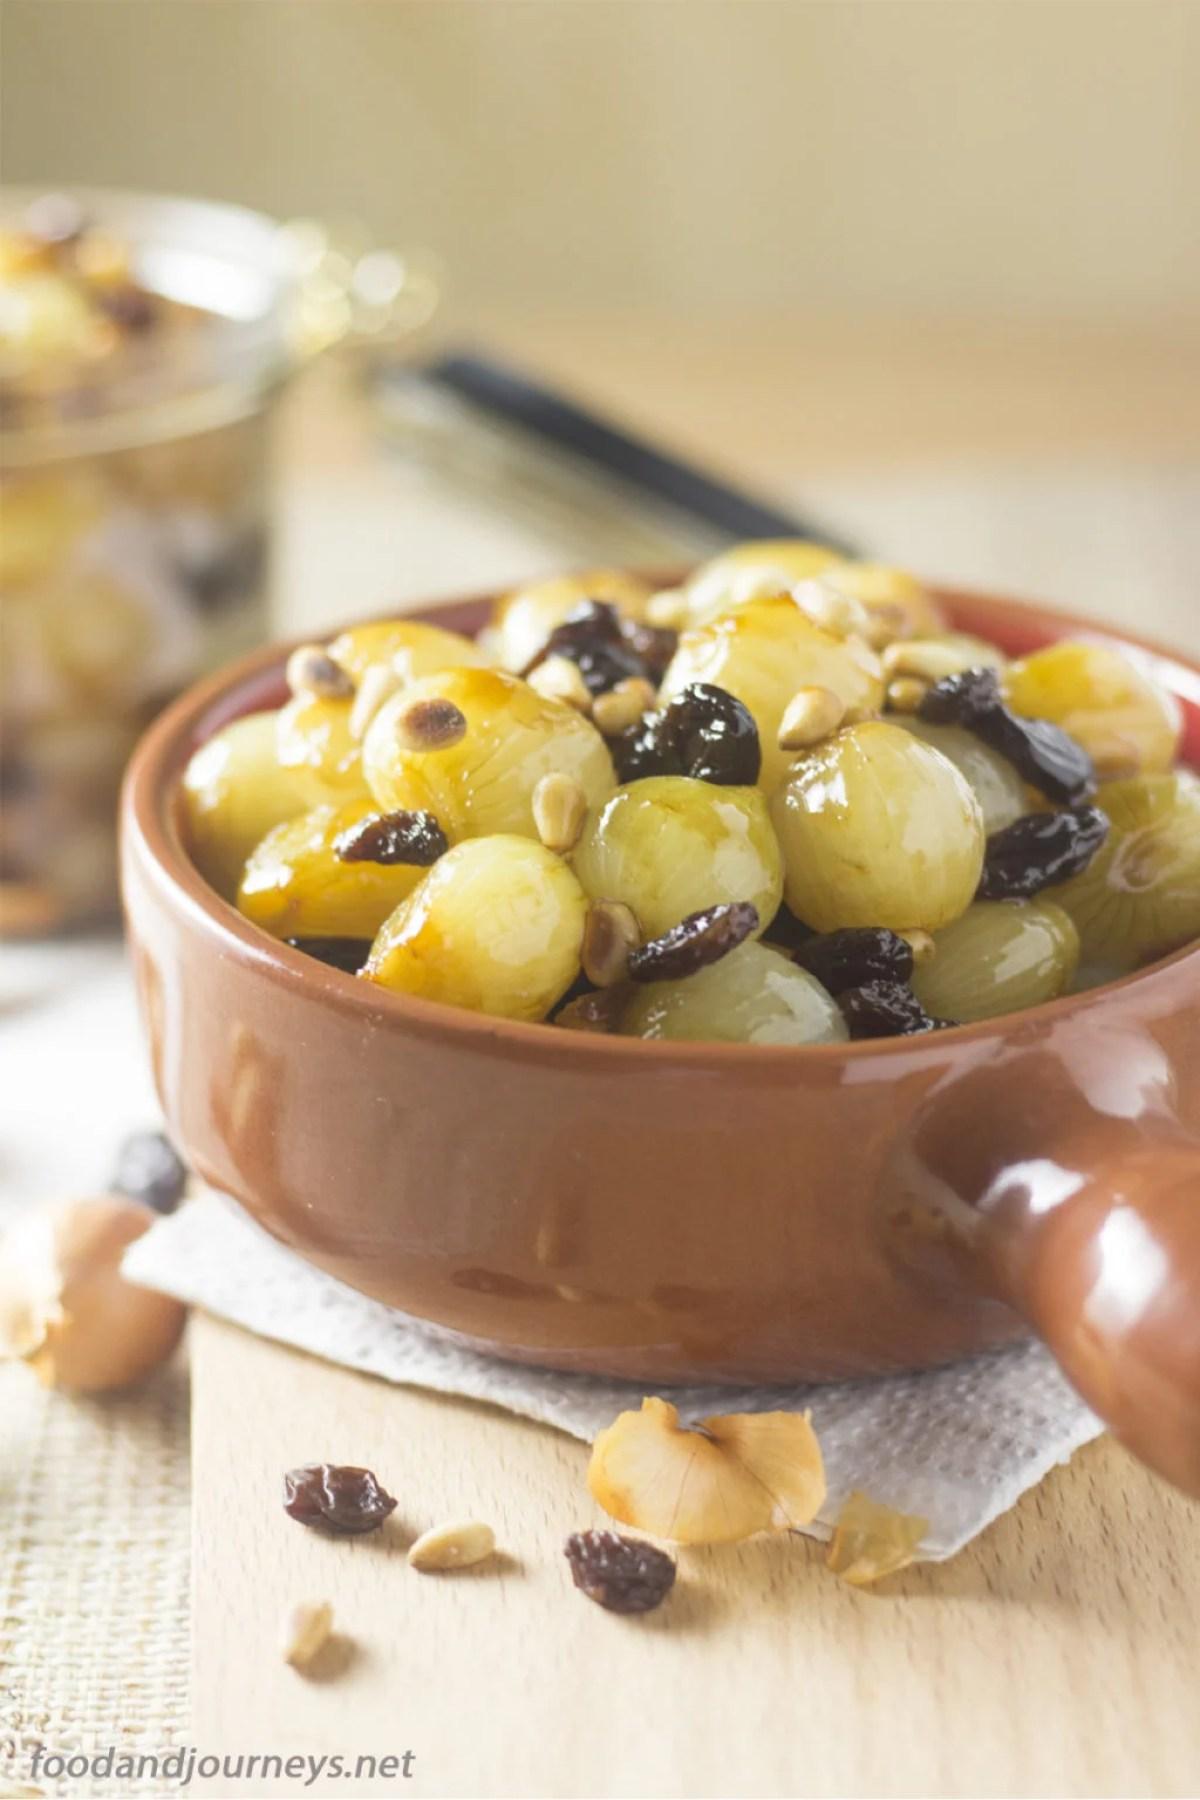 Sweet and Sour Baby Onions |foodandjourneys.net